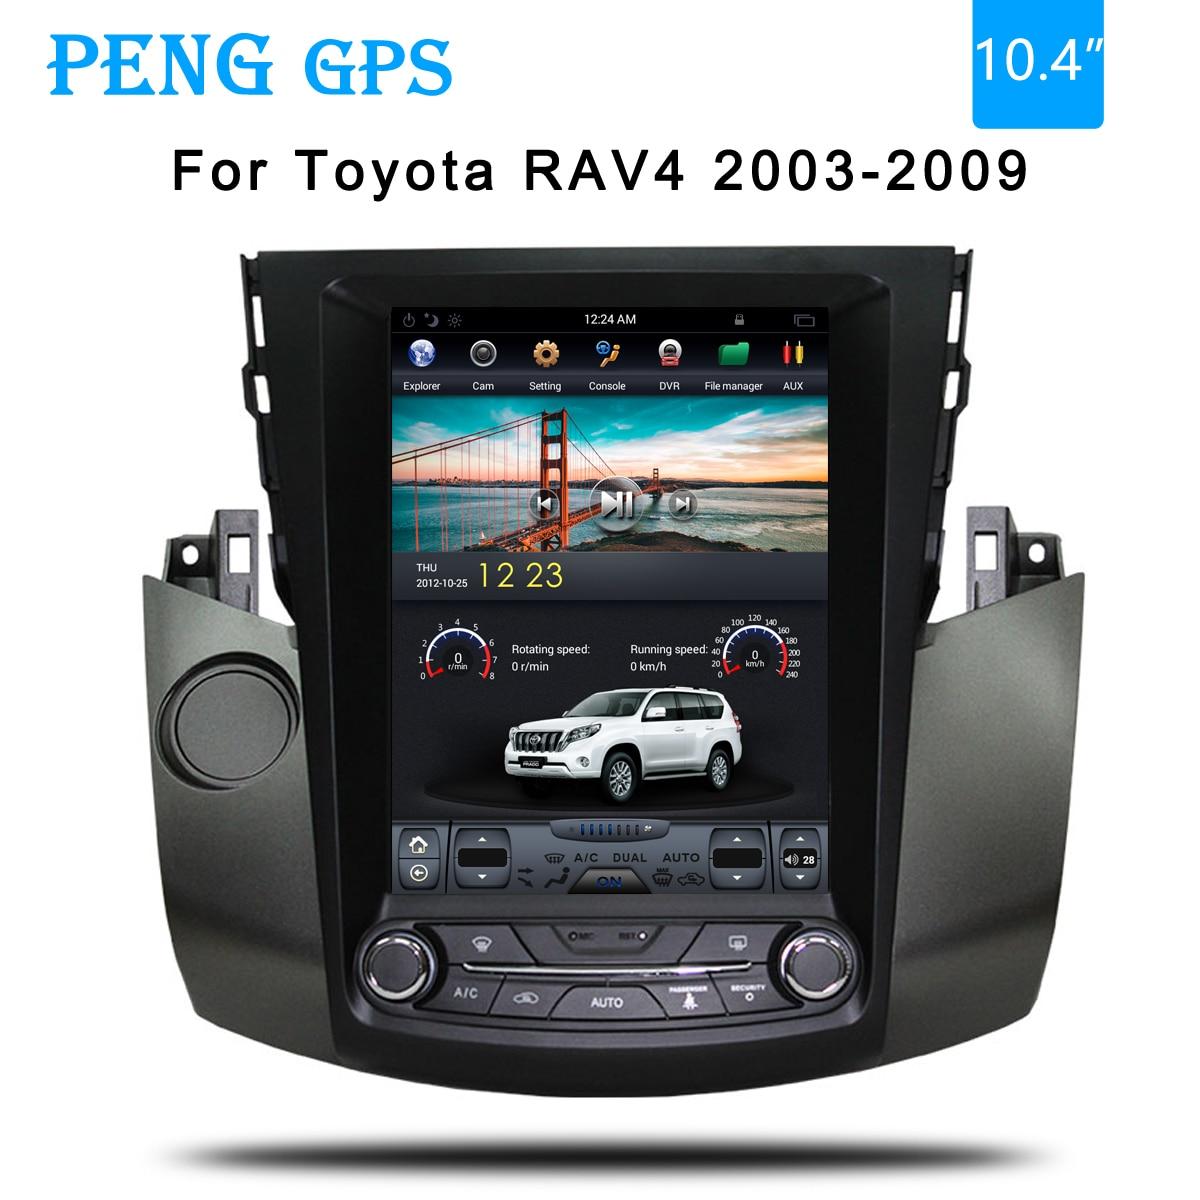 Tesla-voiture de style Toyota RAV4 4   Navigation GPS, pour Toyota RAV4 2003 2004 2005 2006 2007 2008 2009, headunit radio multimédia, lecteur sans DVD 4K